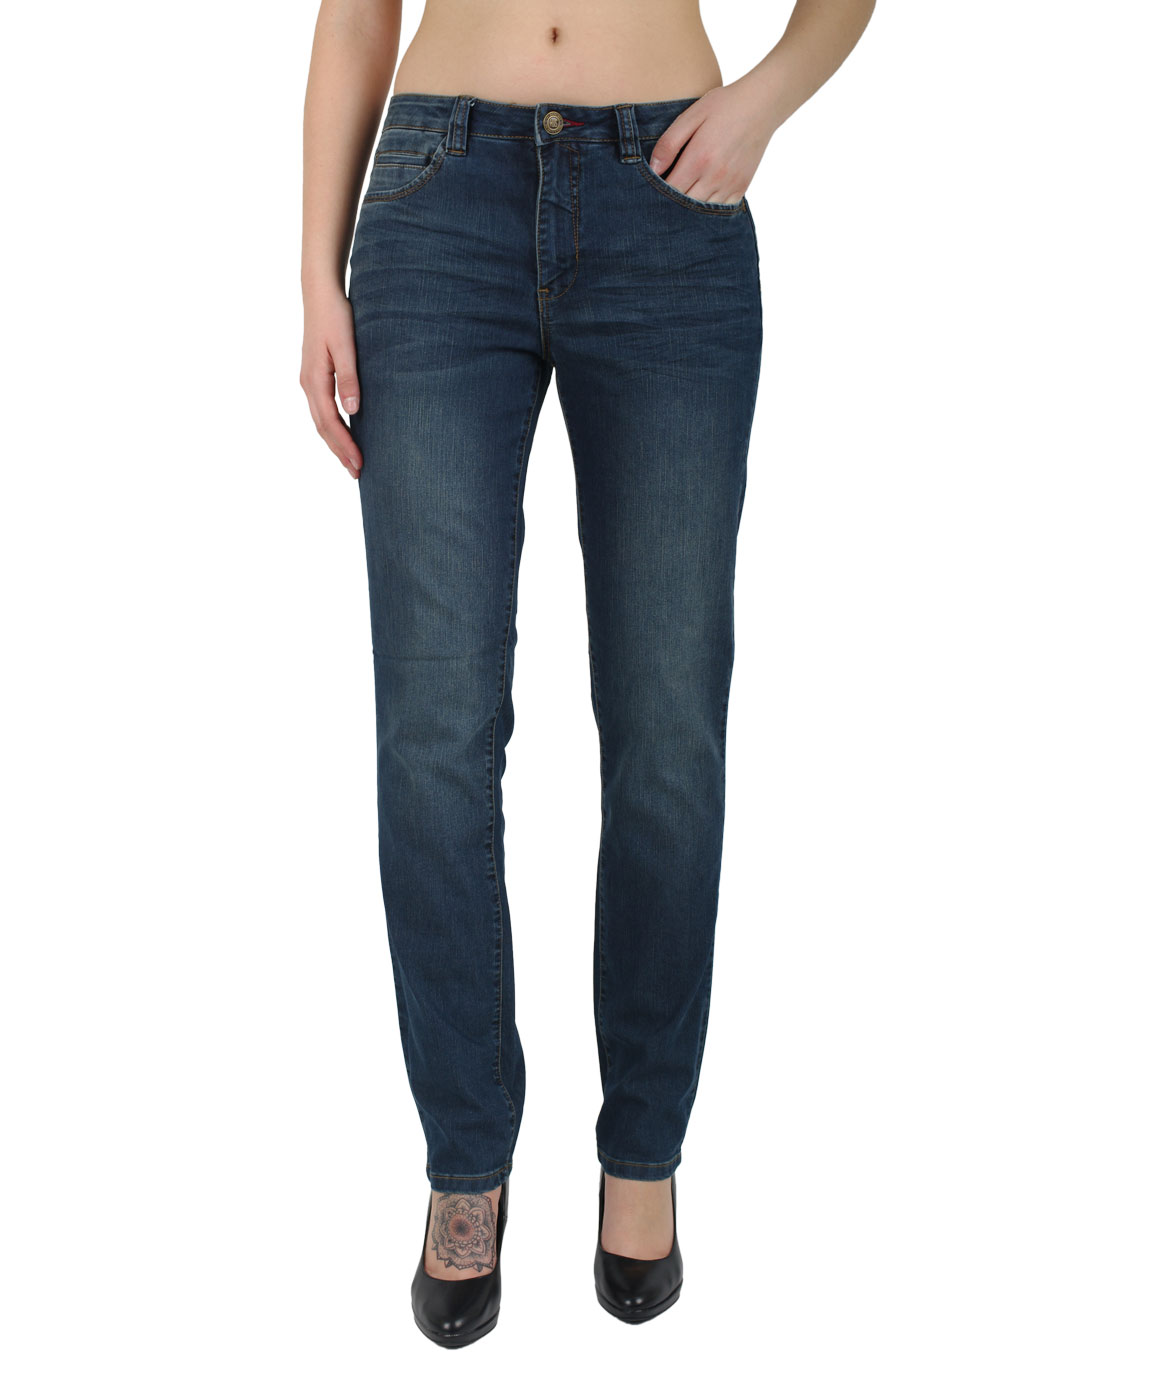 Hosen für Frauen - HIS MARYLIN Jeans Comfort Fit Navy Blue  - Onlineshop Jeans Meile